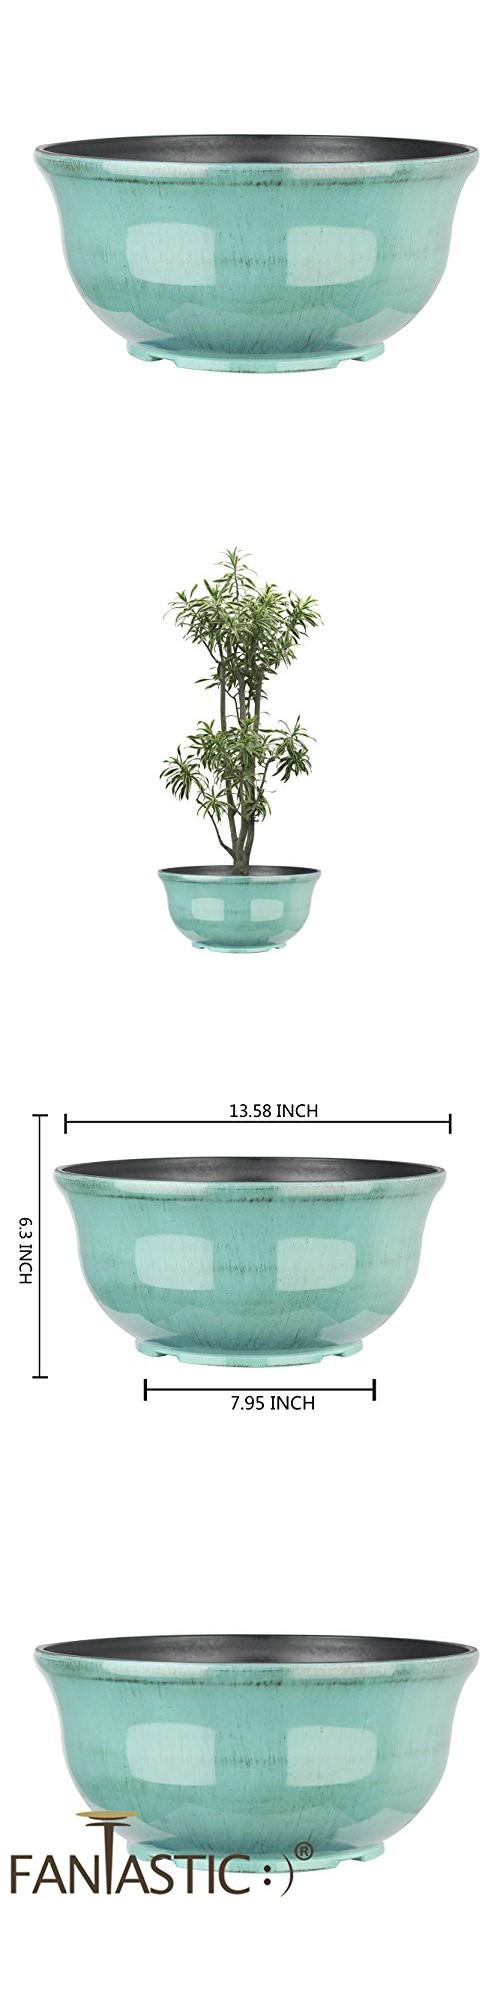 Plastic Decorative Bowls Fantastic™ 135Inch Low Bowl Shinny Finish Decorative Plastic